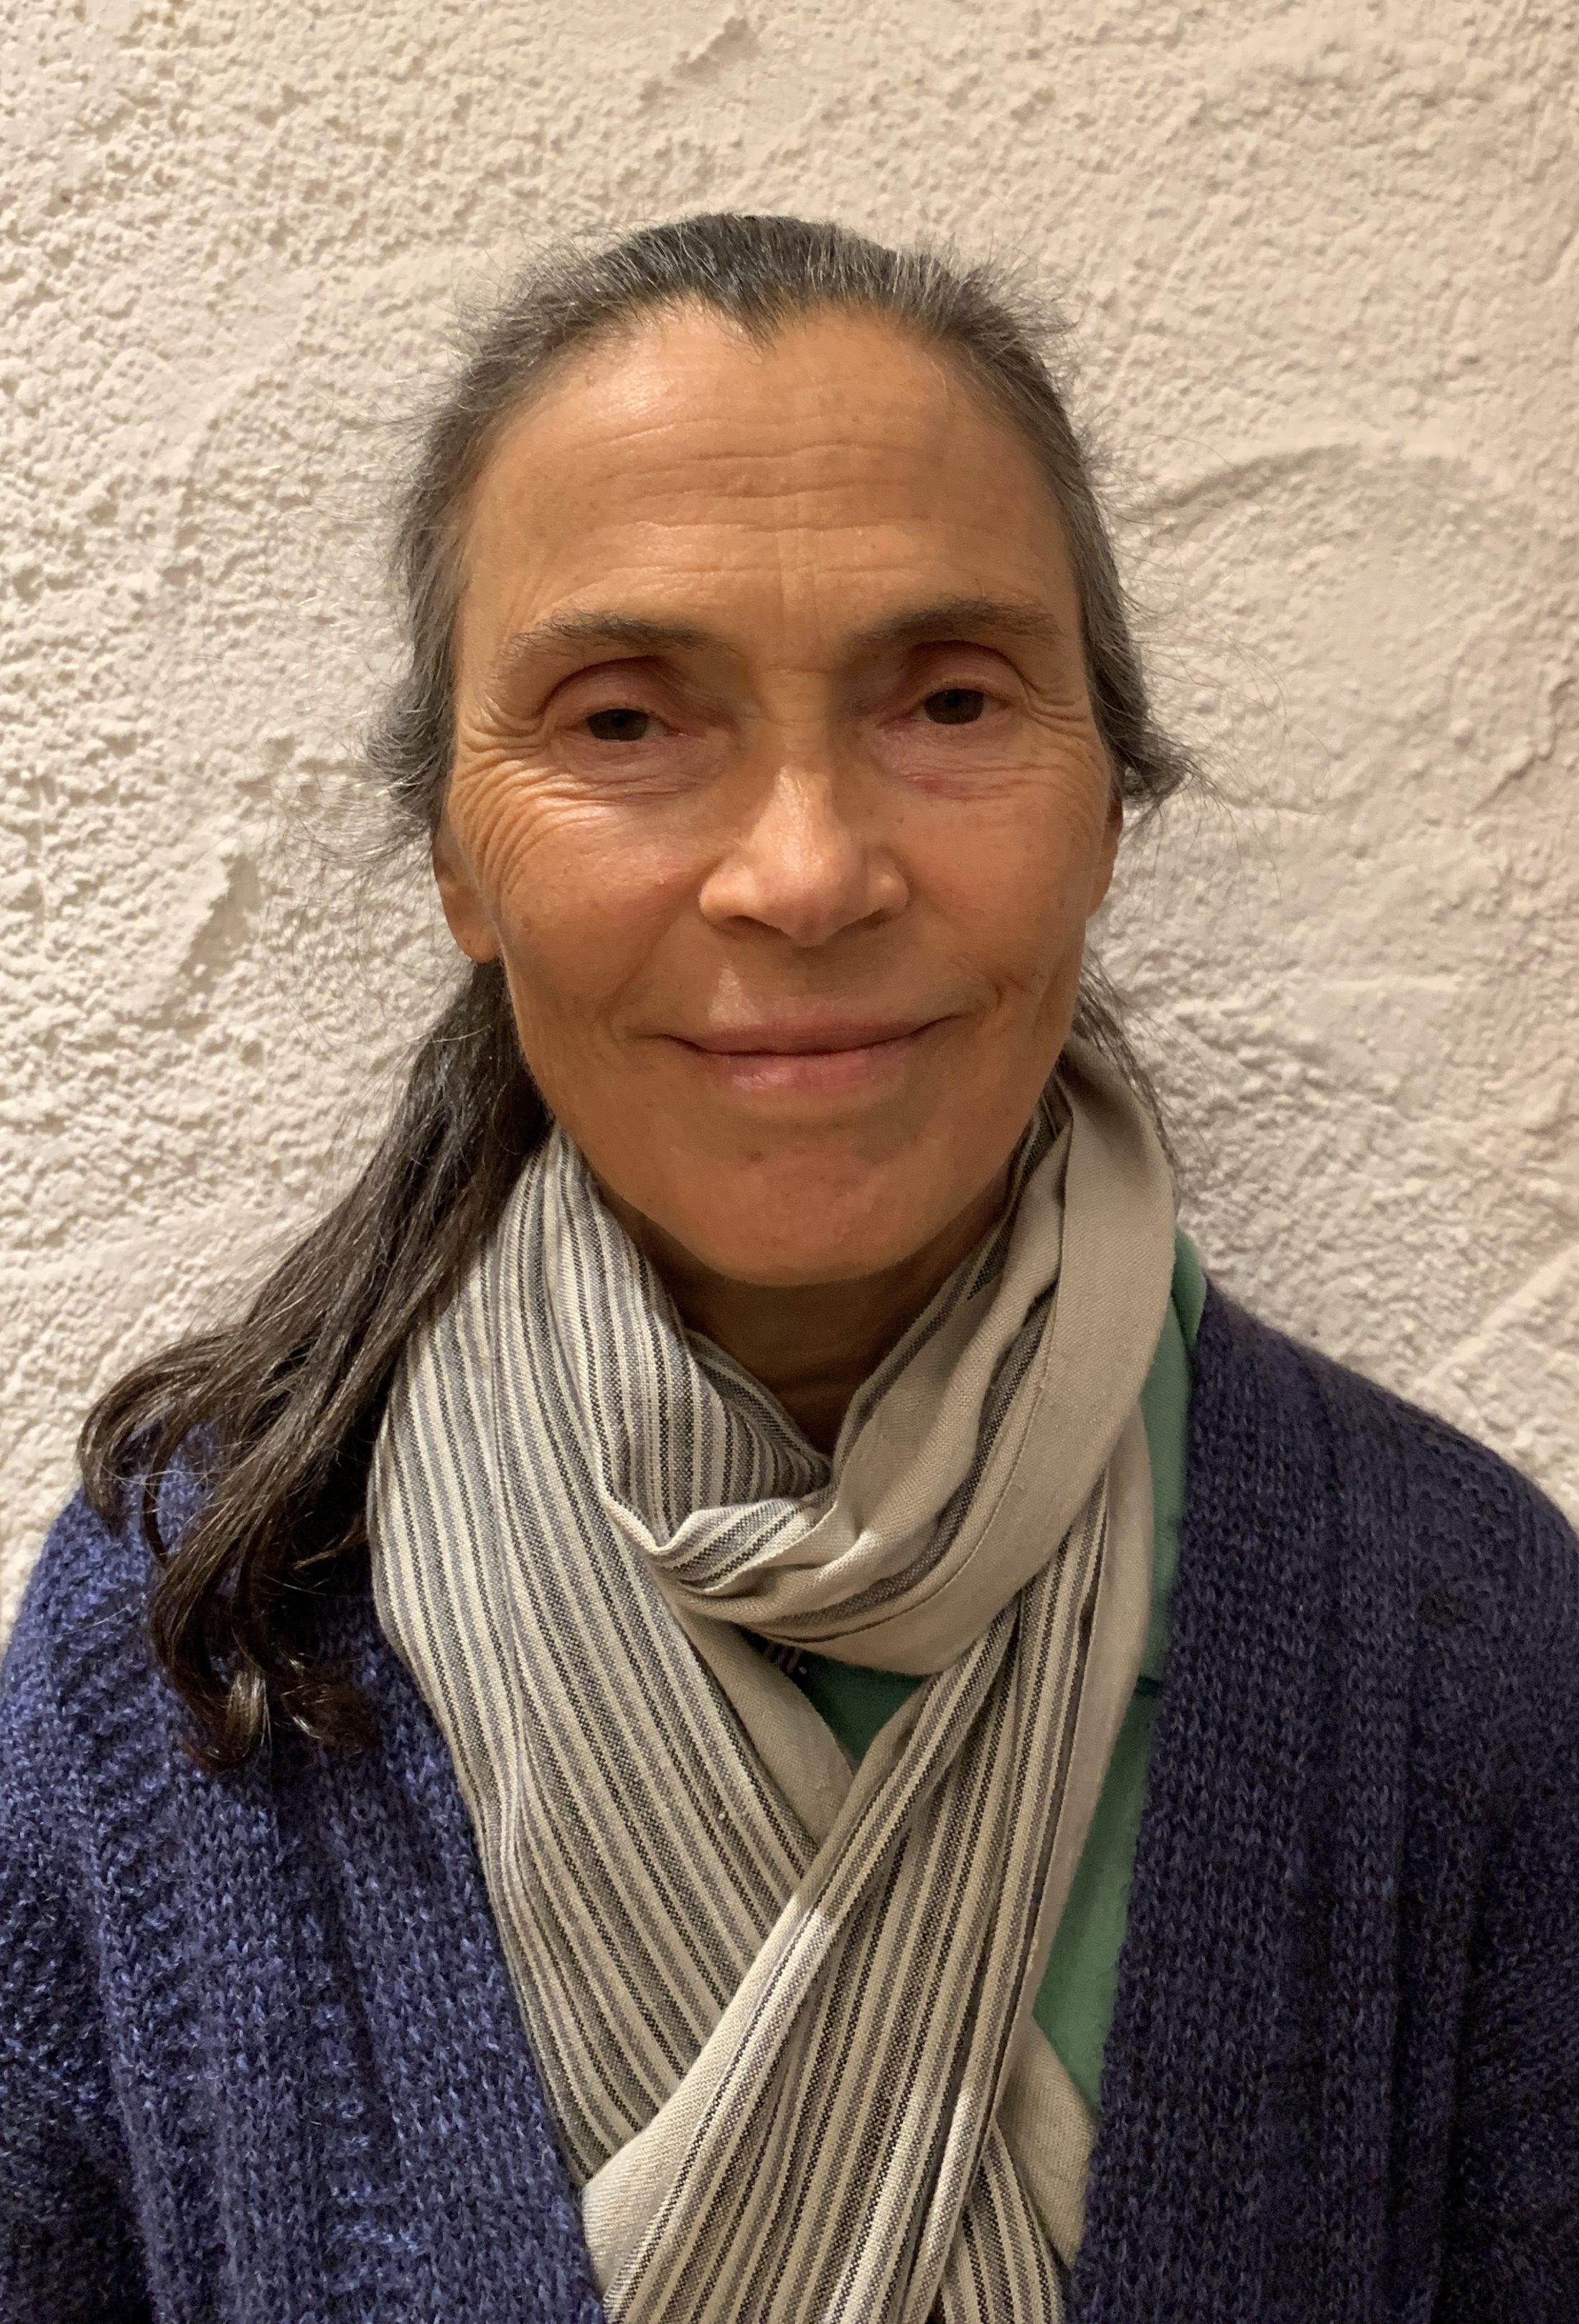 Astrid Weiß